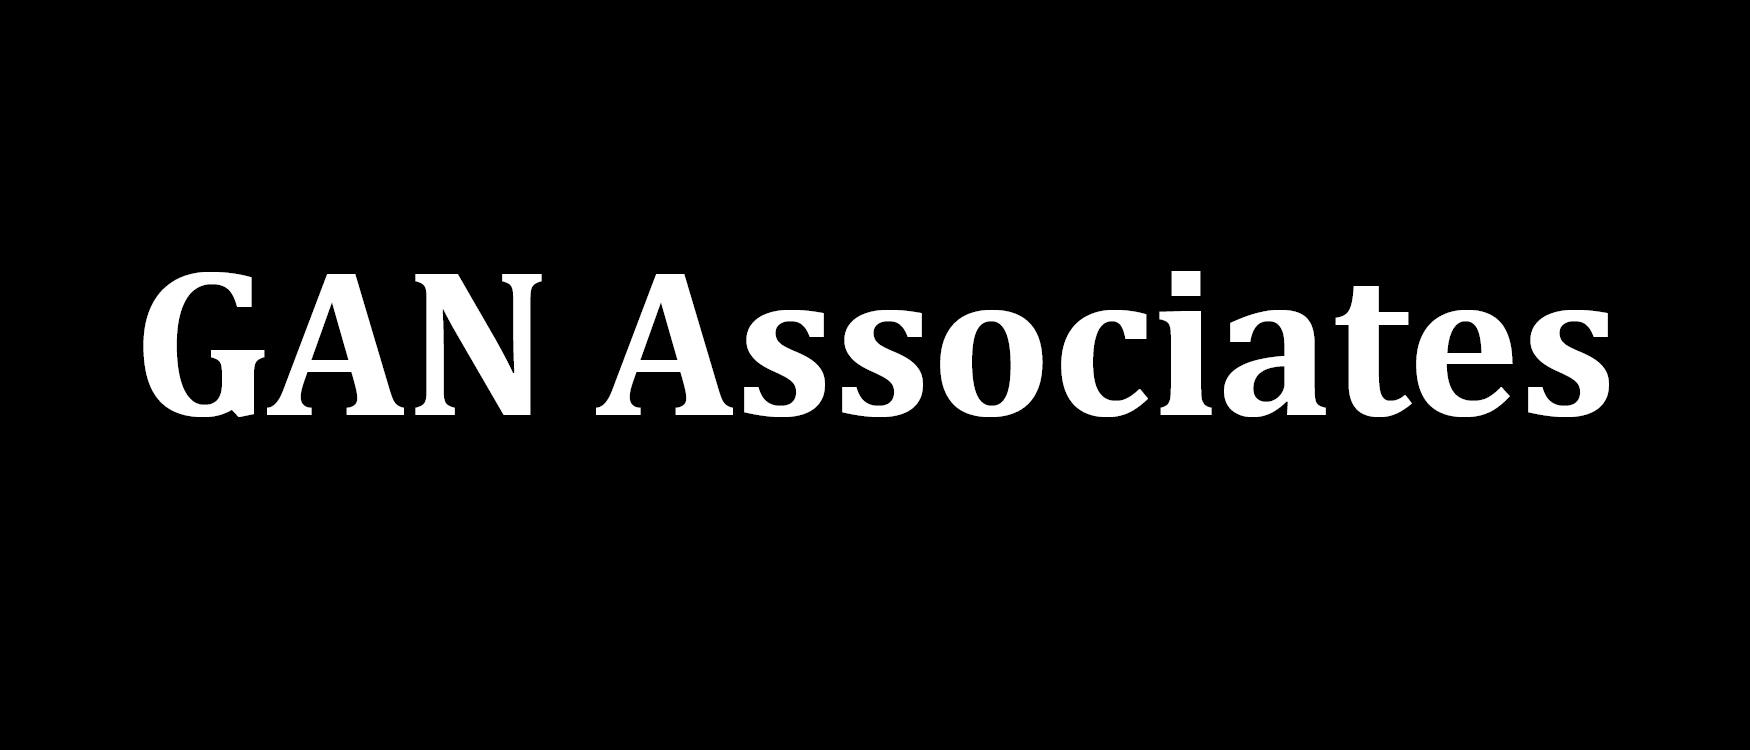 GAN Associates Ltd